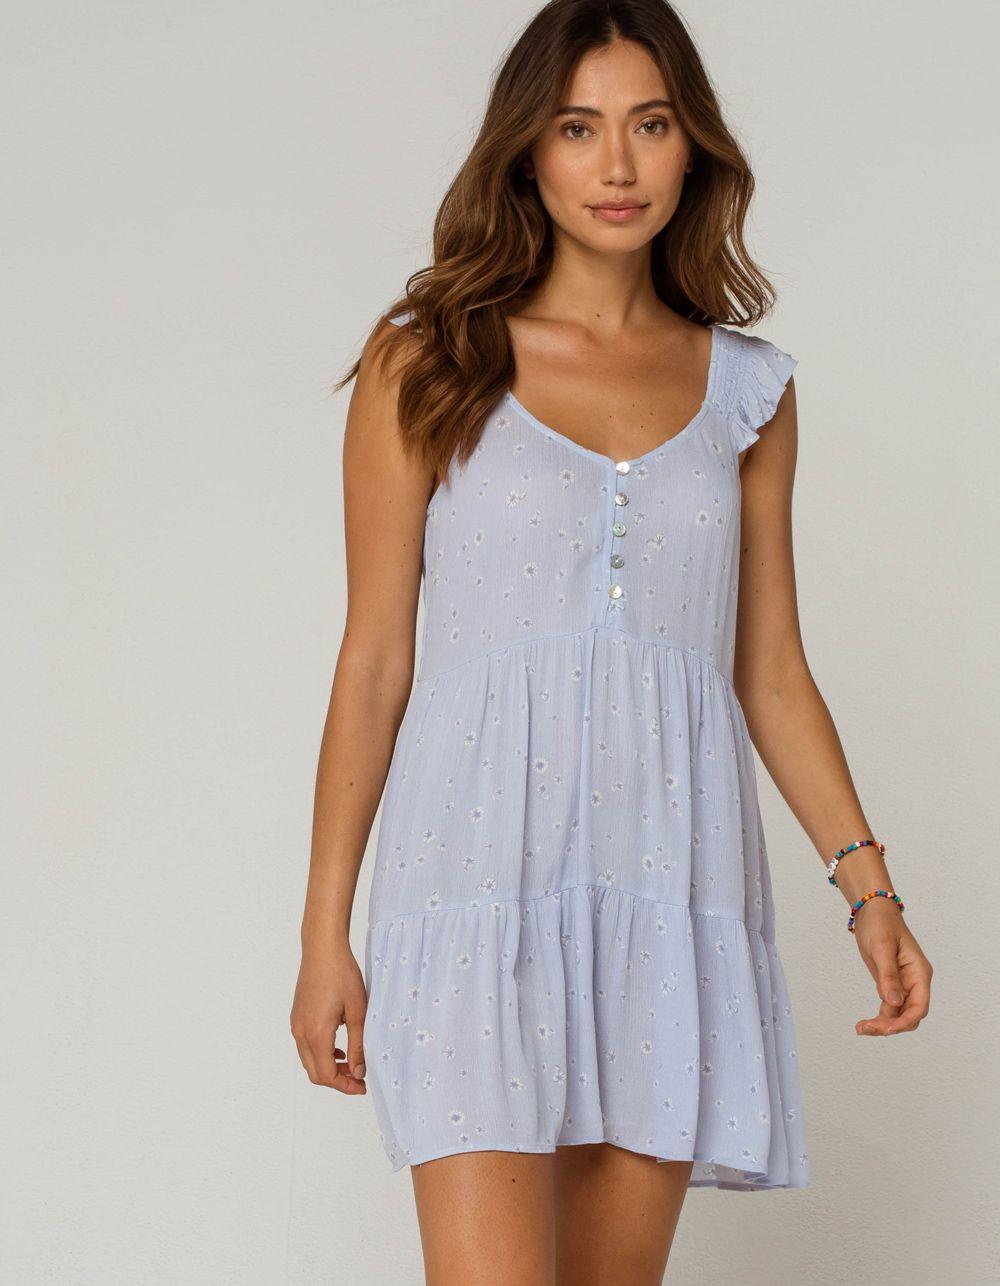 Sky And Sparrow Ditsy Ruffle Tiered Light Blue Babydoll Dress Ltblu 369185221 Babydoll Dress Dresses Blue Babydoll Dress [ 1286 x 1000 Pixel ]